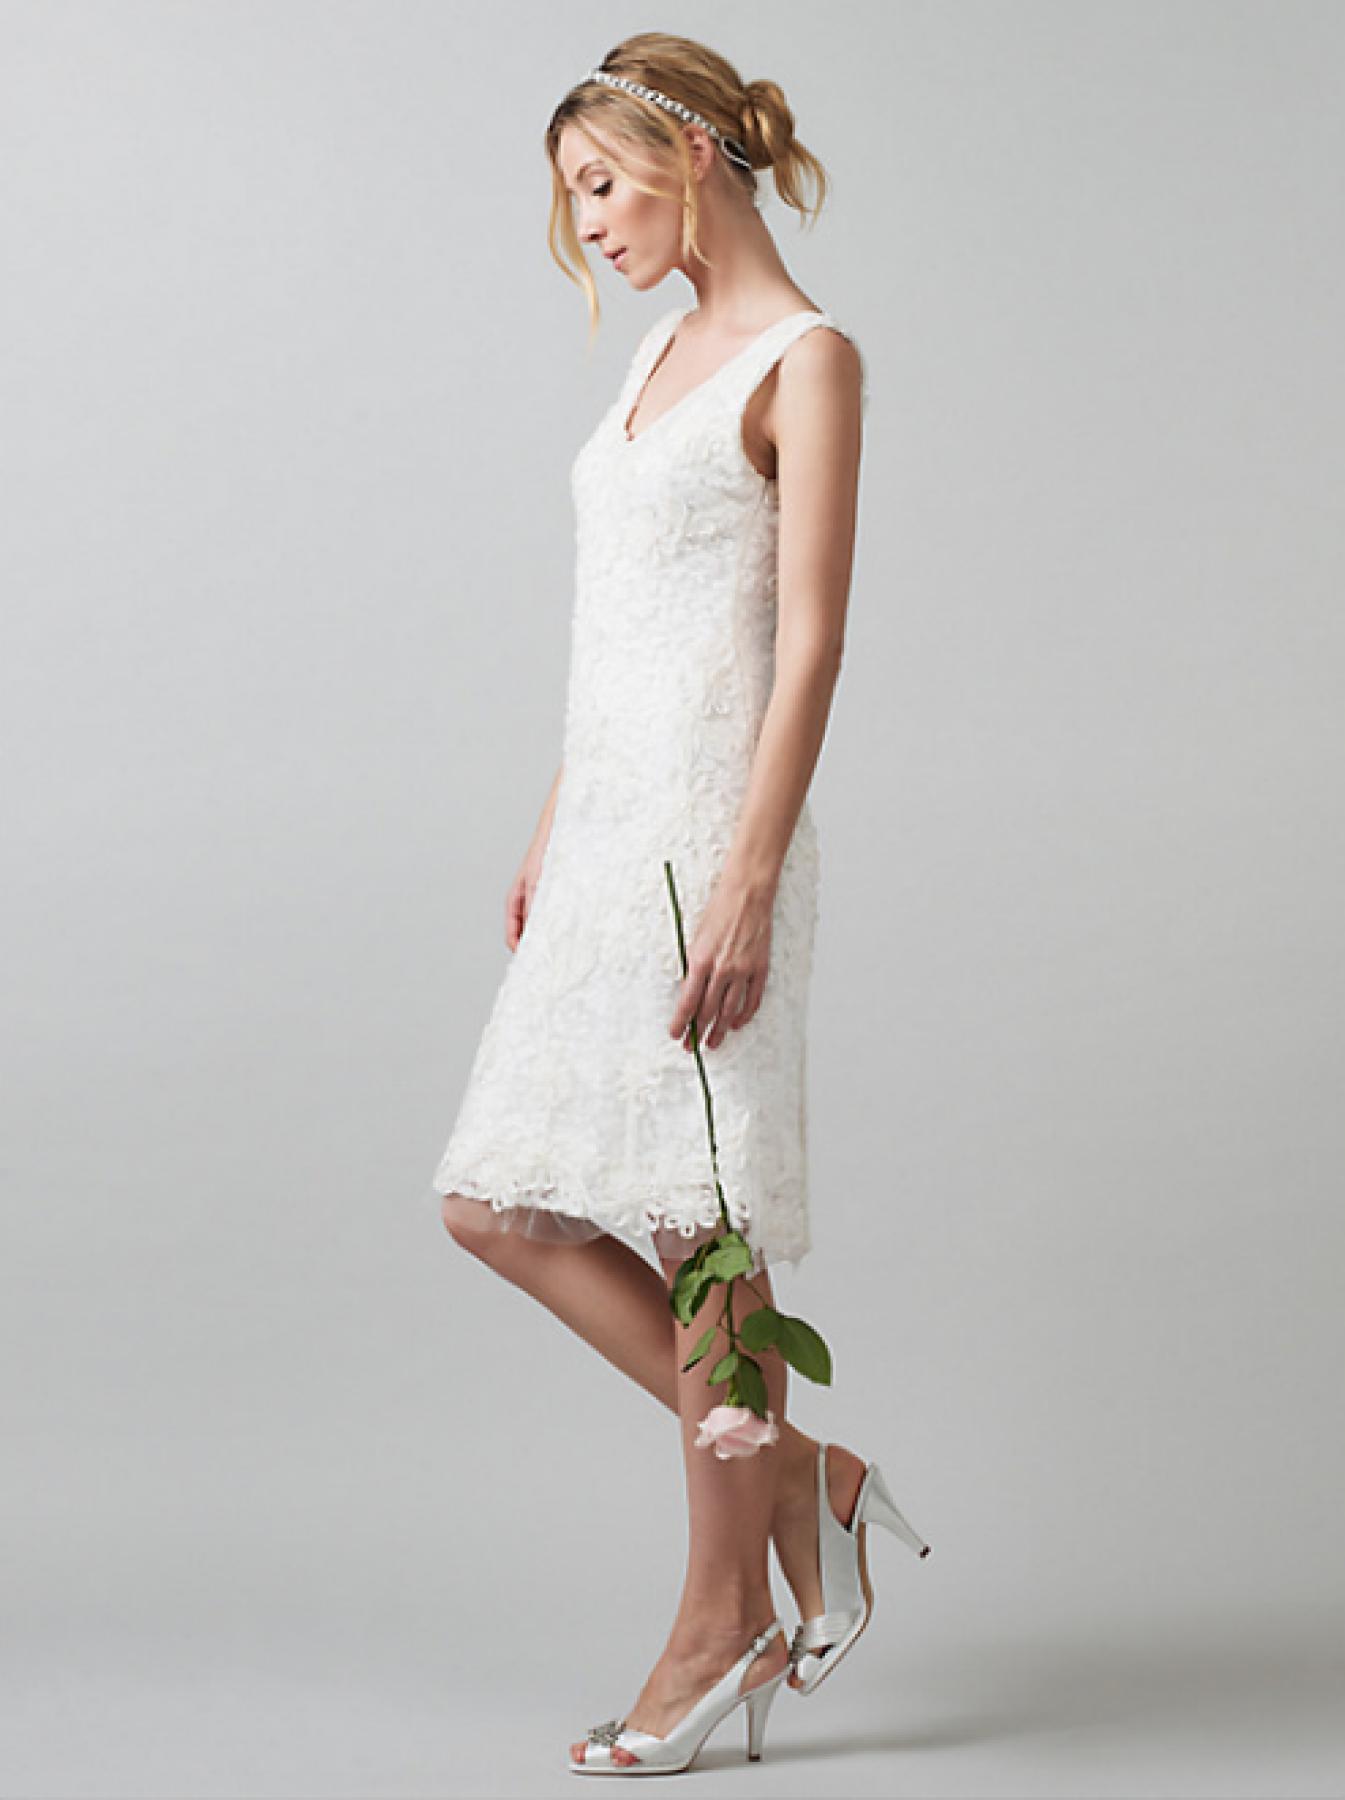 John lewis wedding dresses wedding dress designers for John lewis wedding dresses